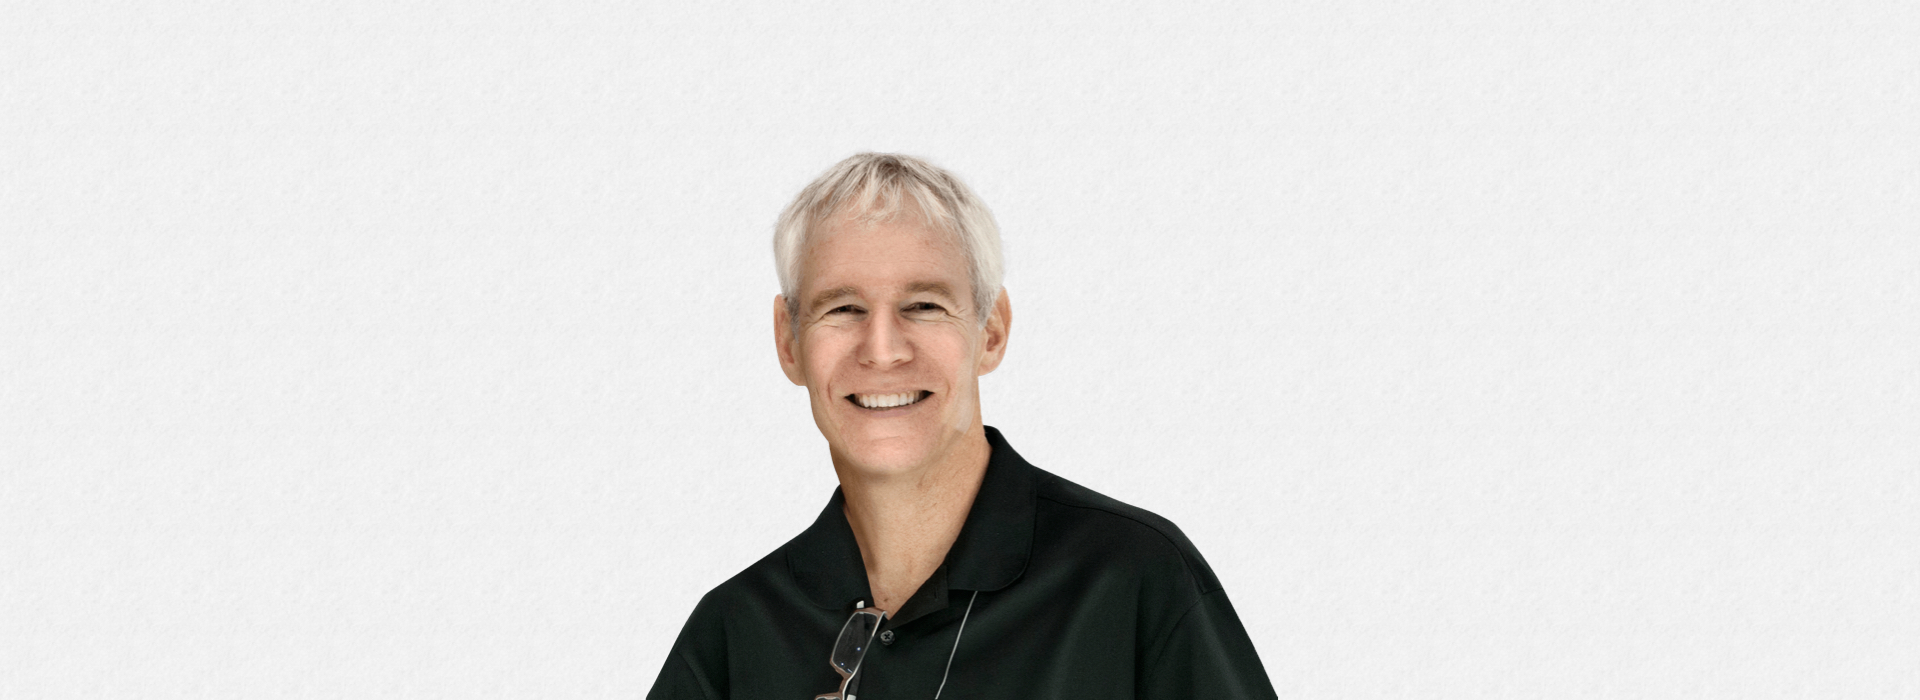 Spencer Frazer, Sog Founder and Chief Designer